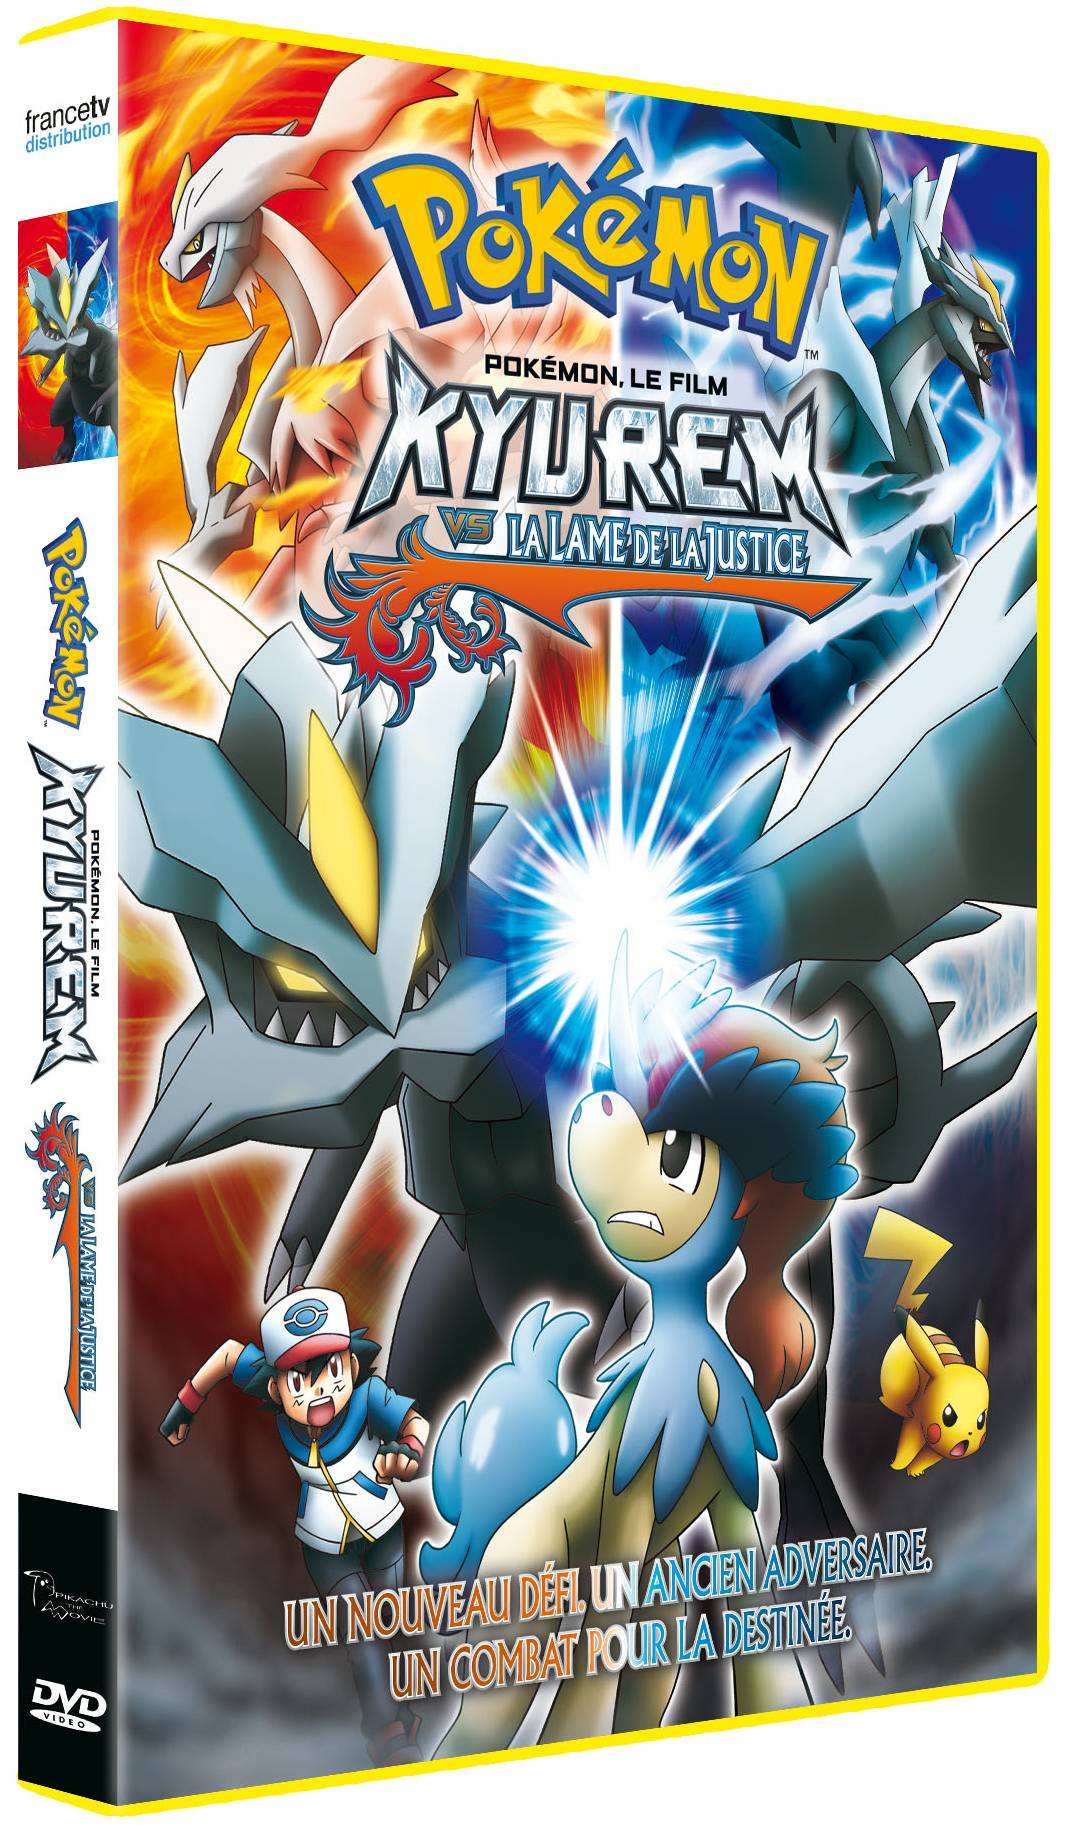 Kyurem VS la lame de la justice, sortira en DVD le 21 août 2013 chez France TV.